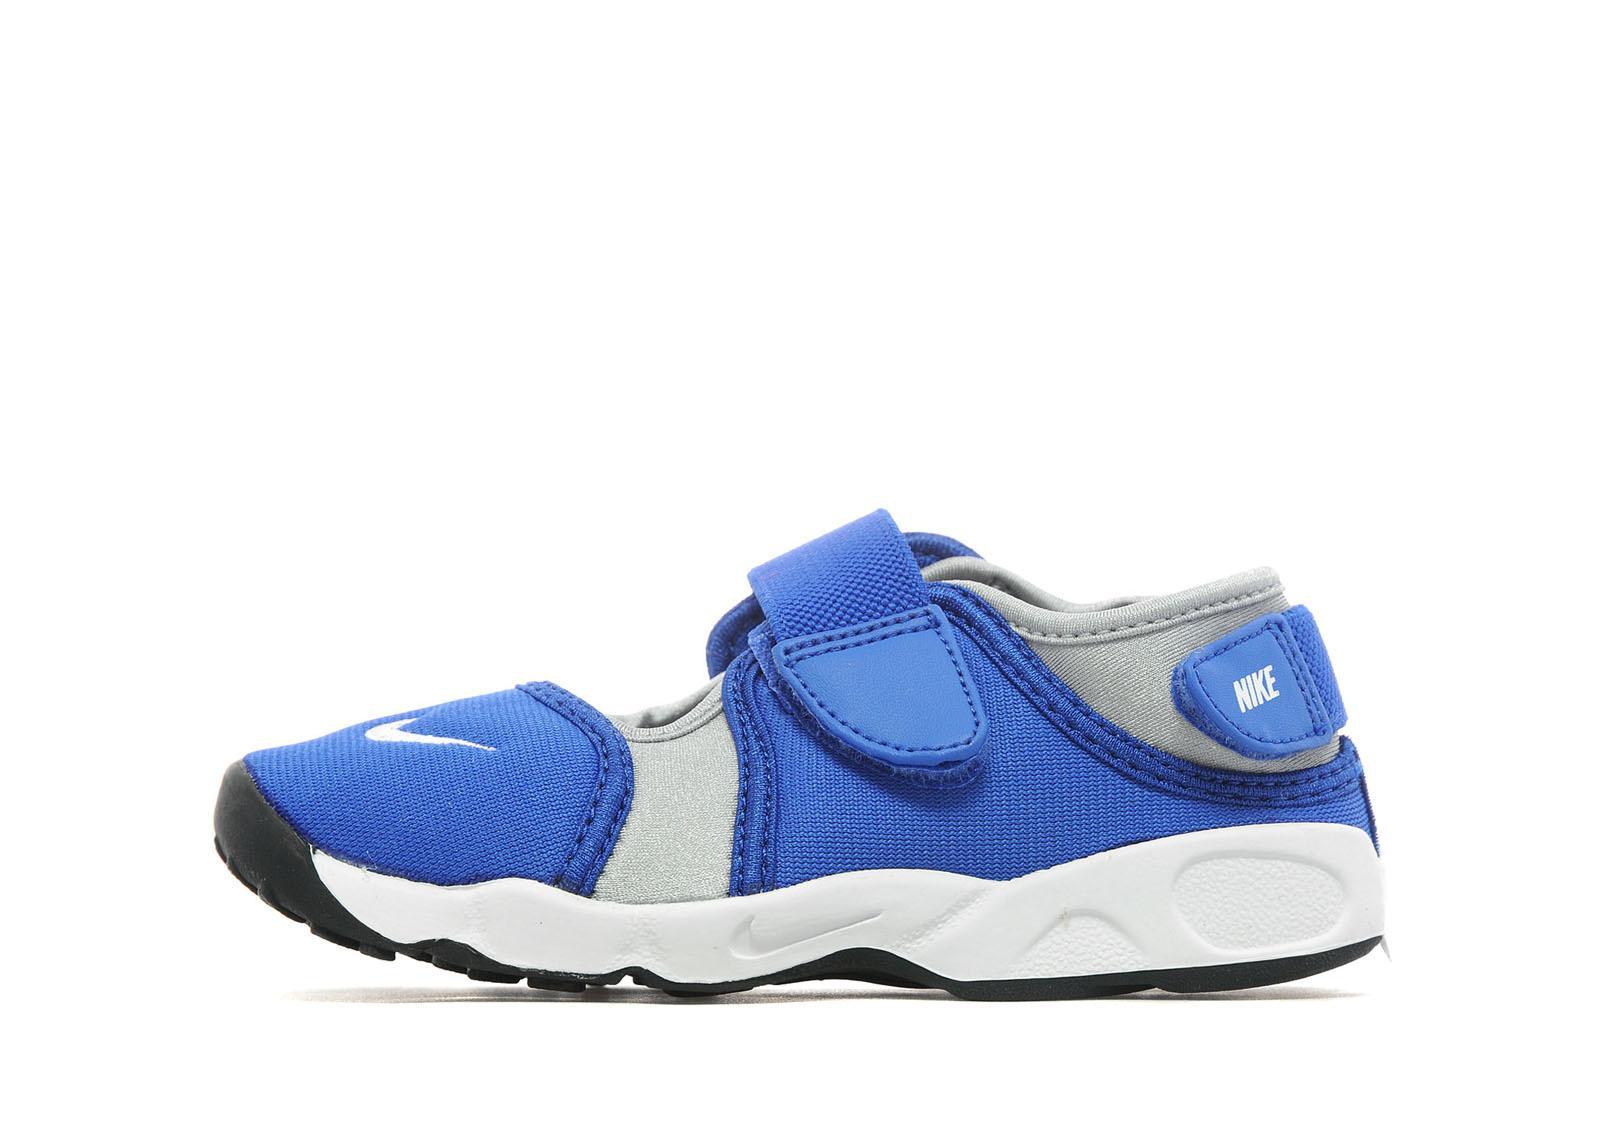 2acd7c491005b4 Vegan Nike Running Shoes Damn Kicks